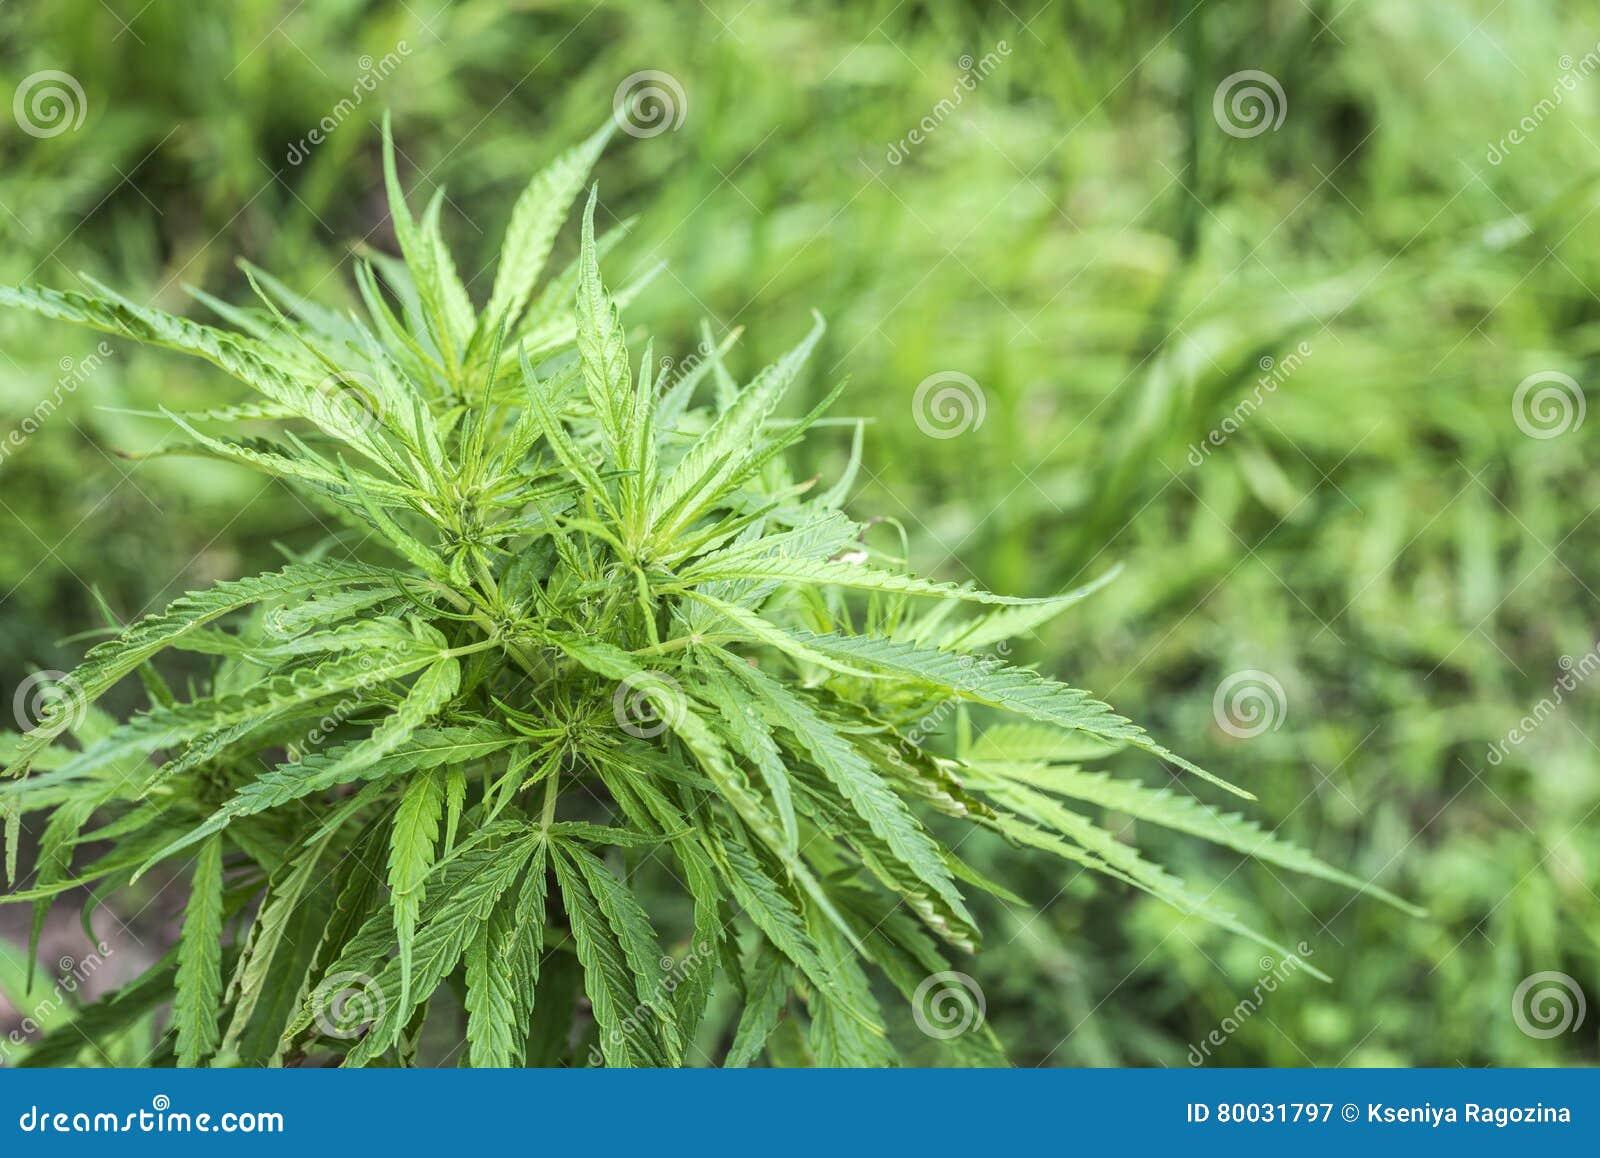 Марихуана медицинские цели марихуана на сленге